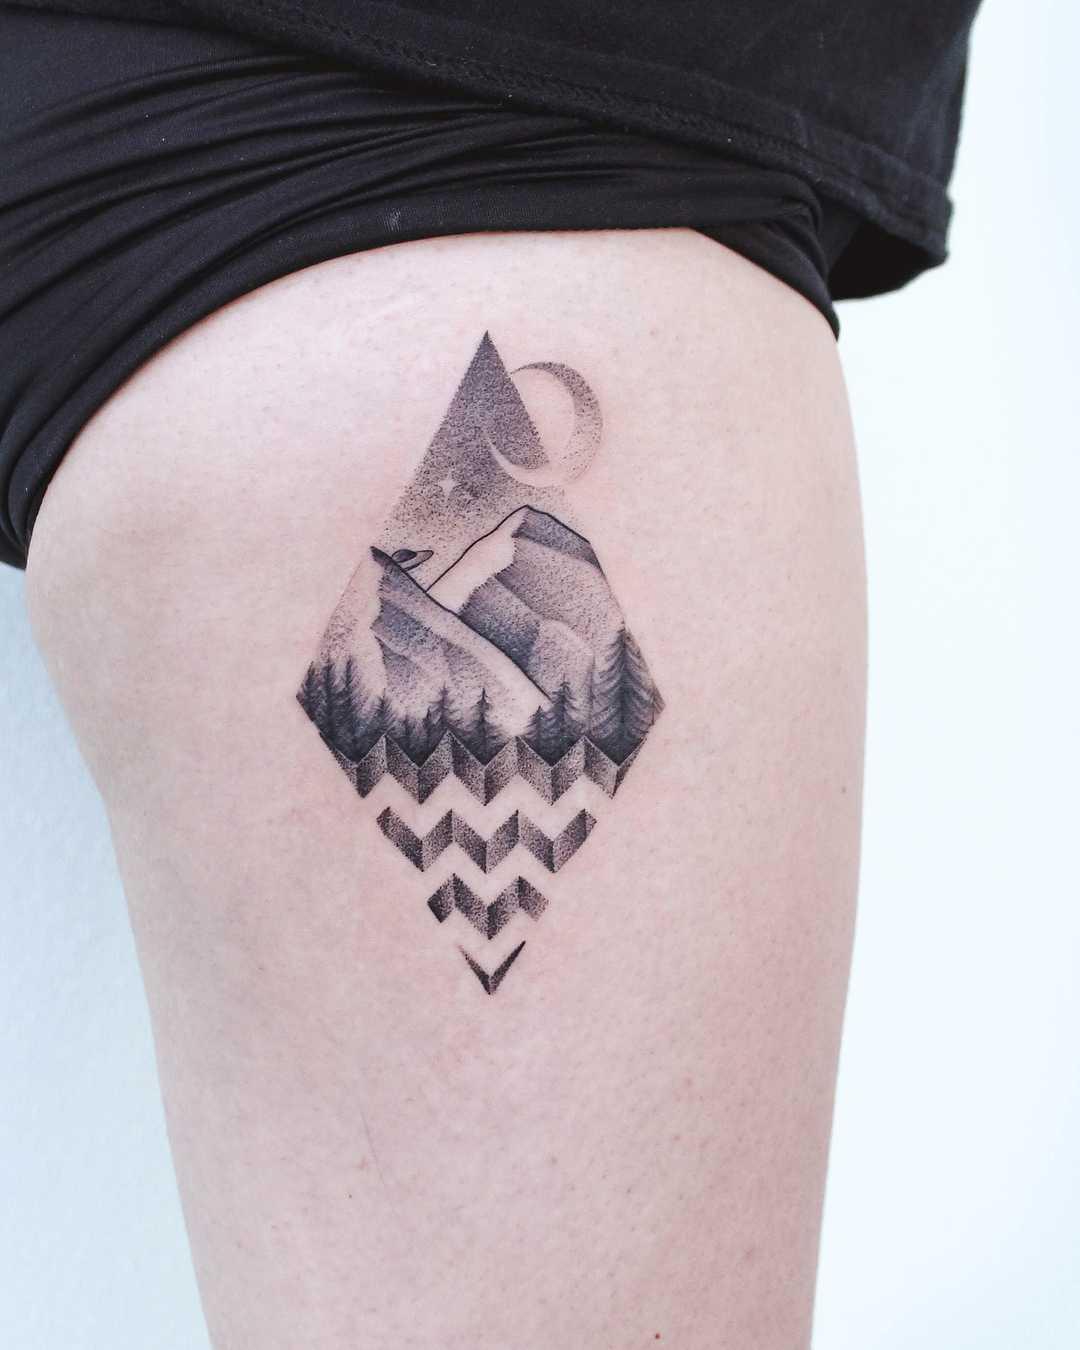 Twin Peaks-inspired tattoo